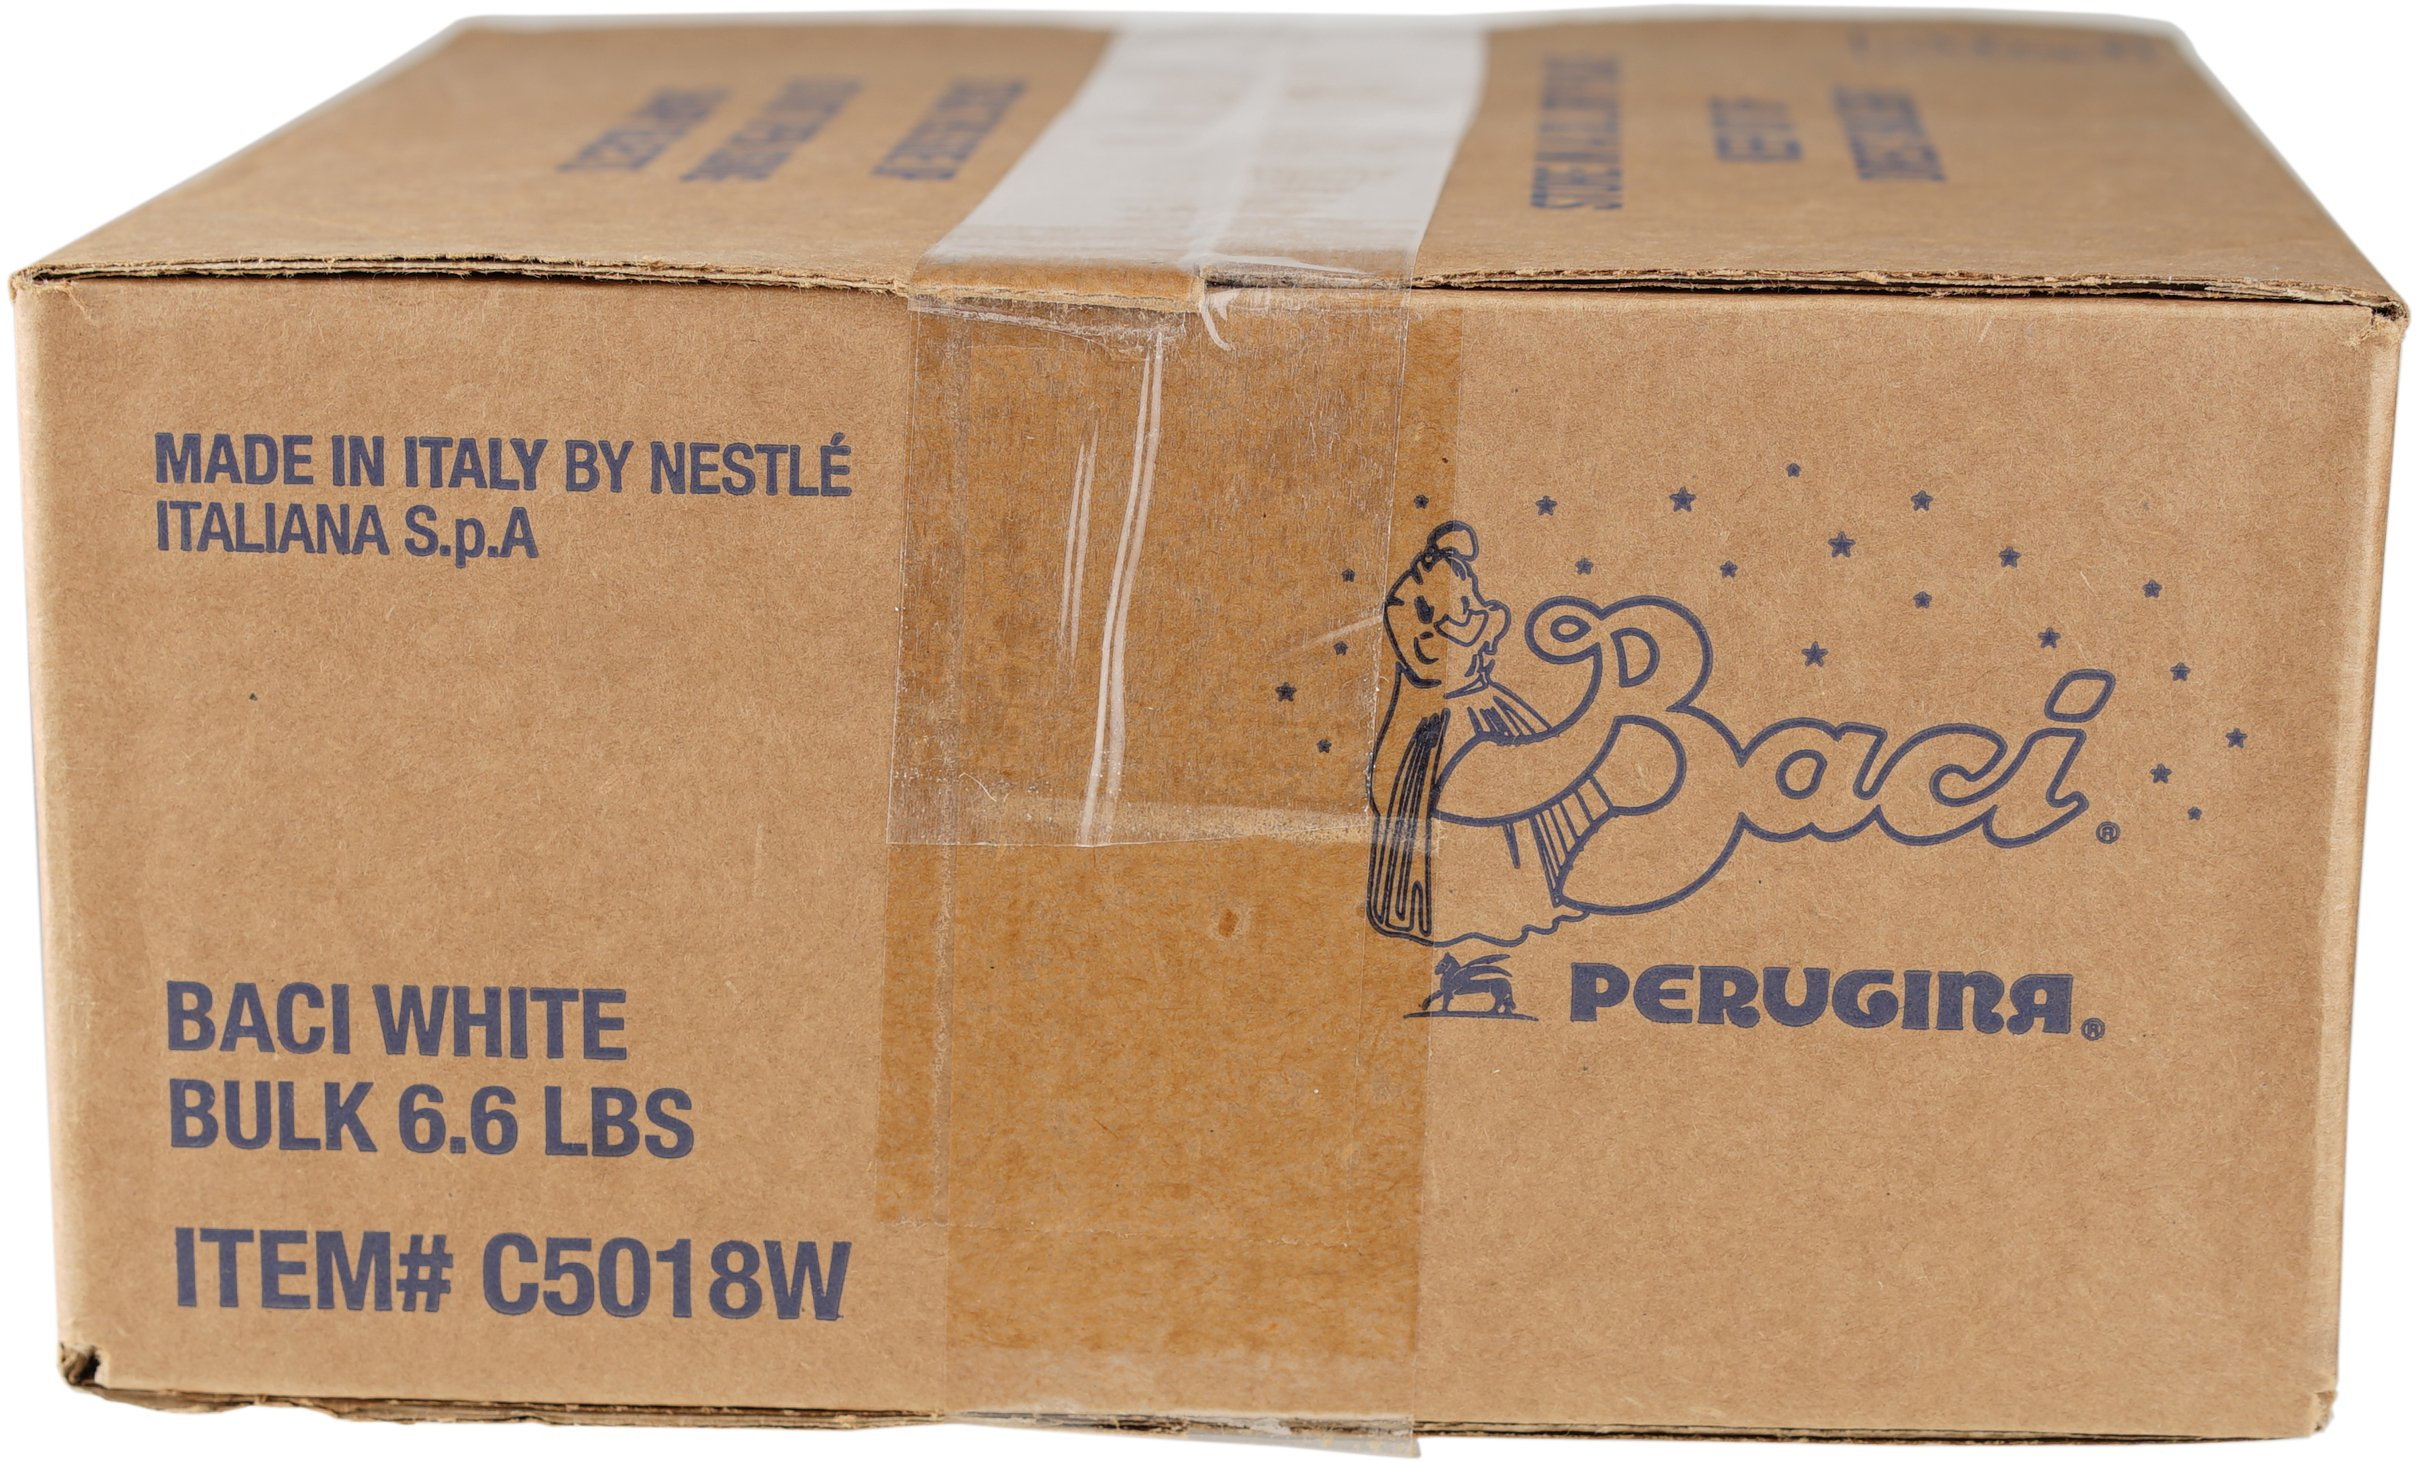 Perugina Baci Chocolate Bulk Box, White, 6.6 Pound by Perugina (Image #6)